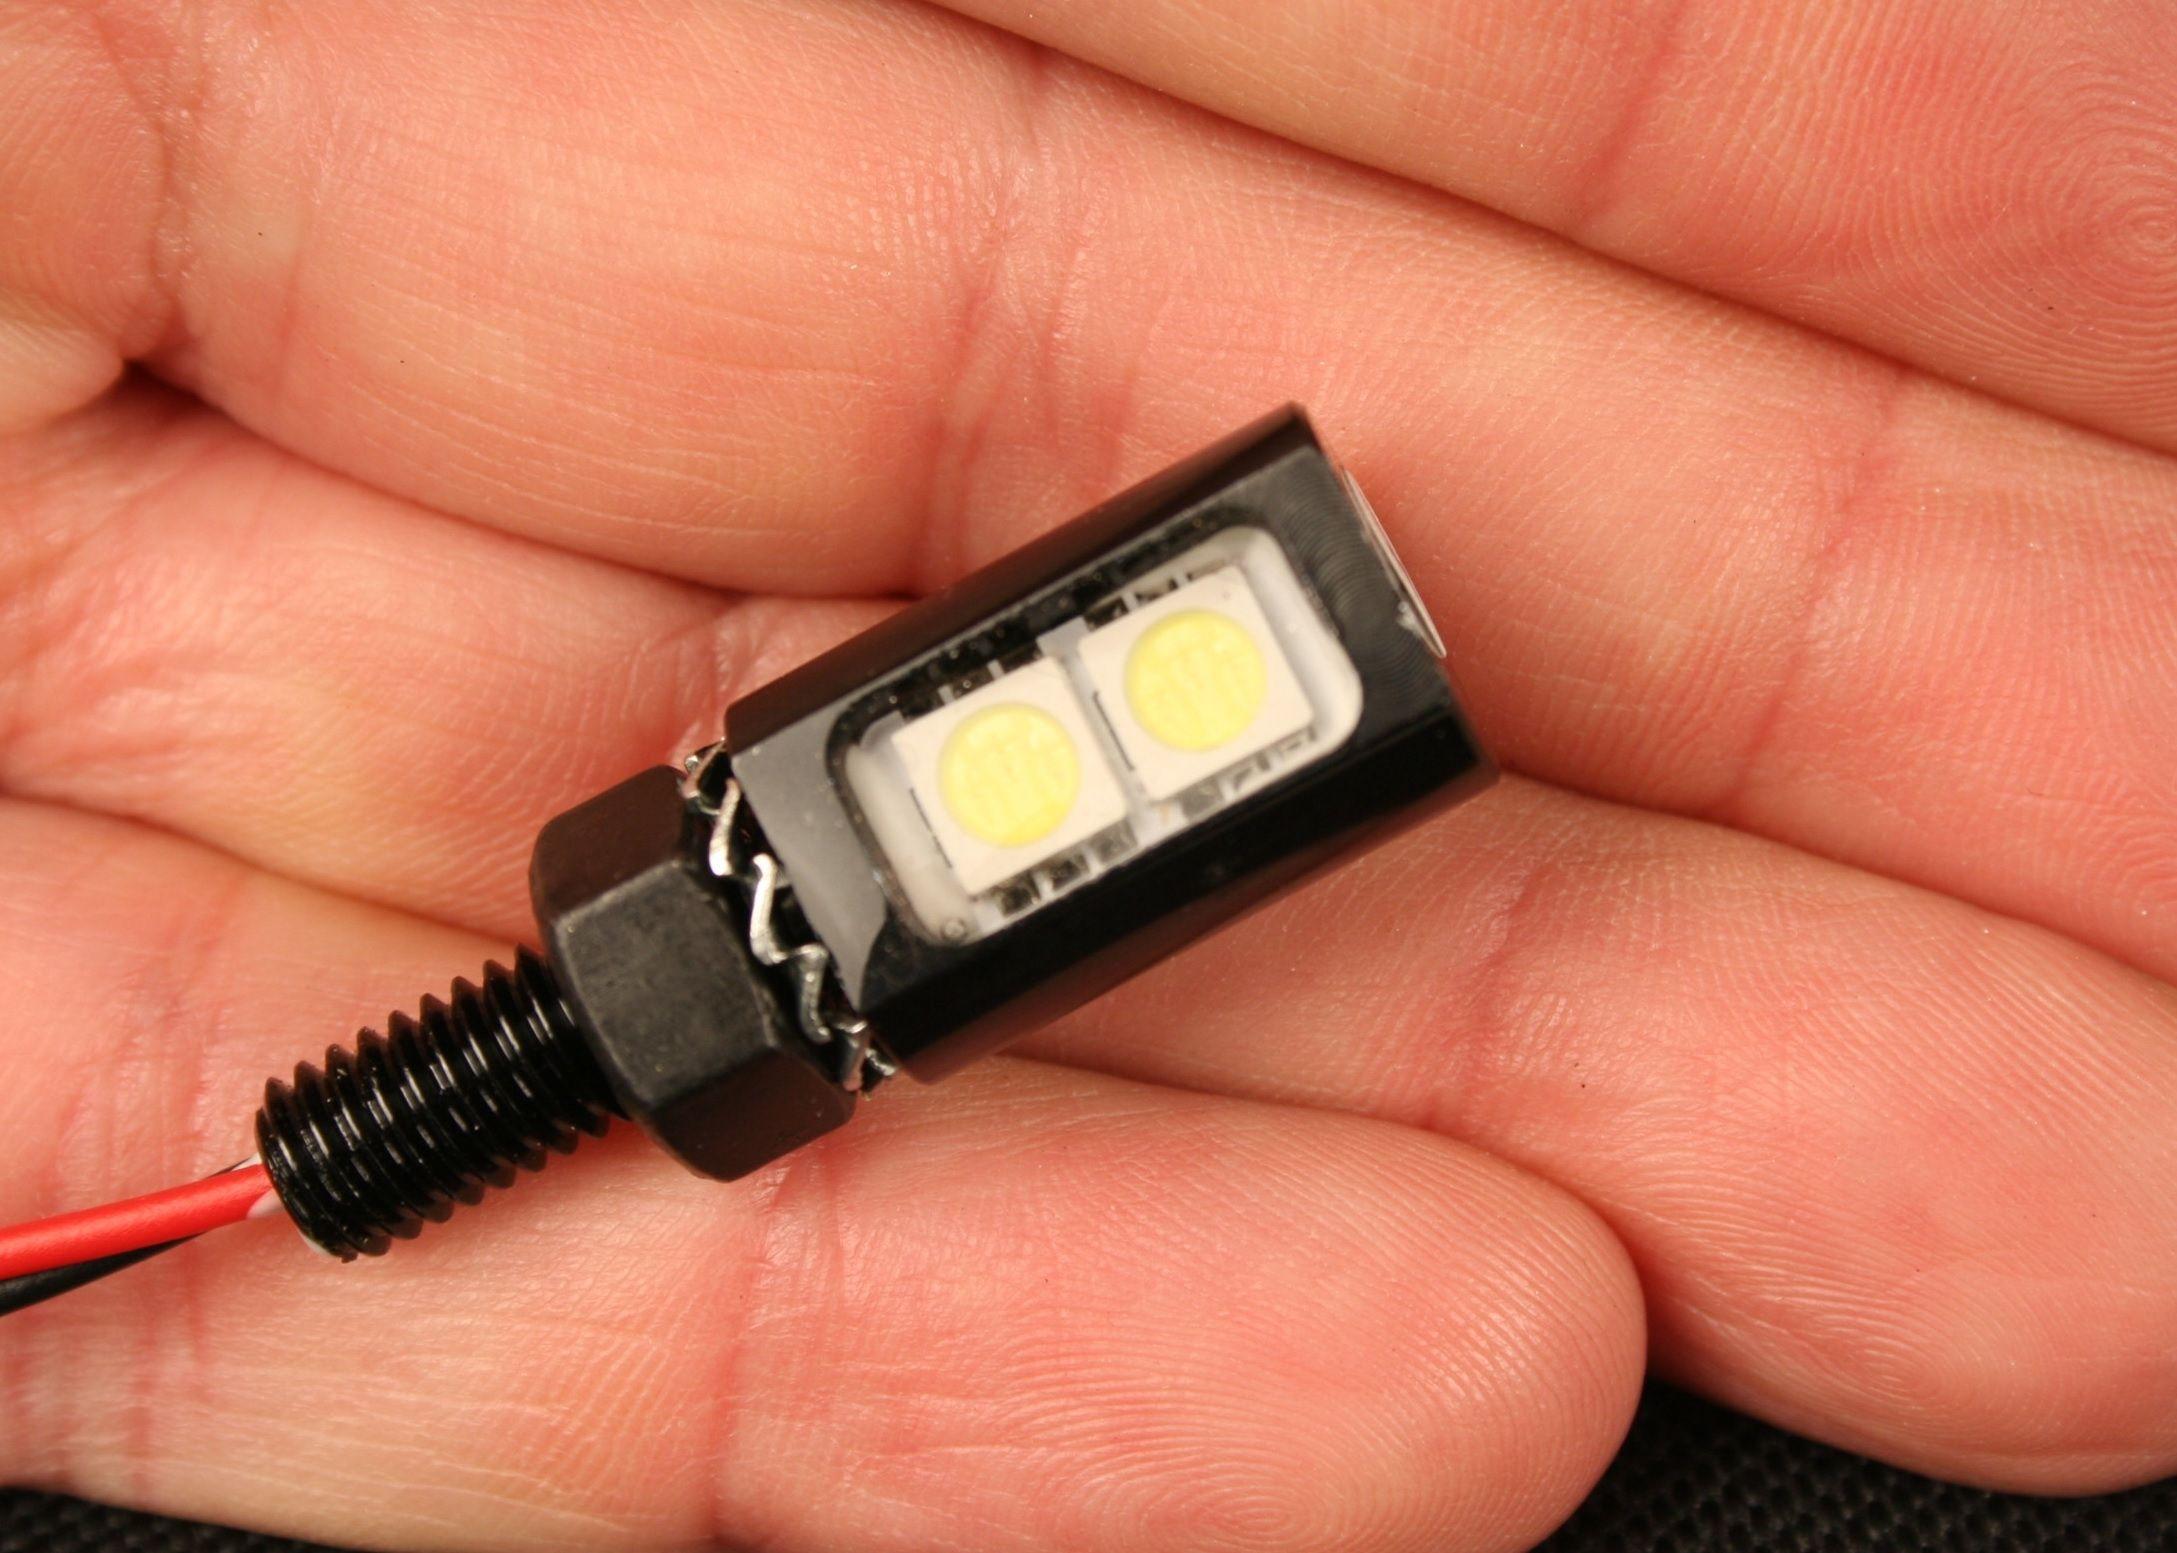 12 volt led light fixtures marine httpdeai rankfo 12 volt led light fixtures marine arubaitofo Image collections